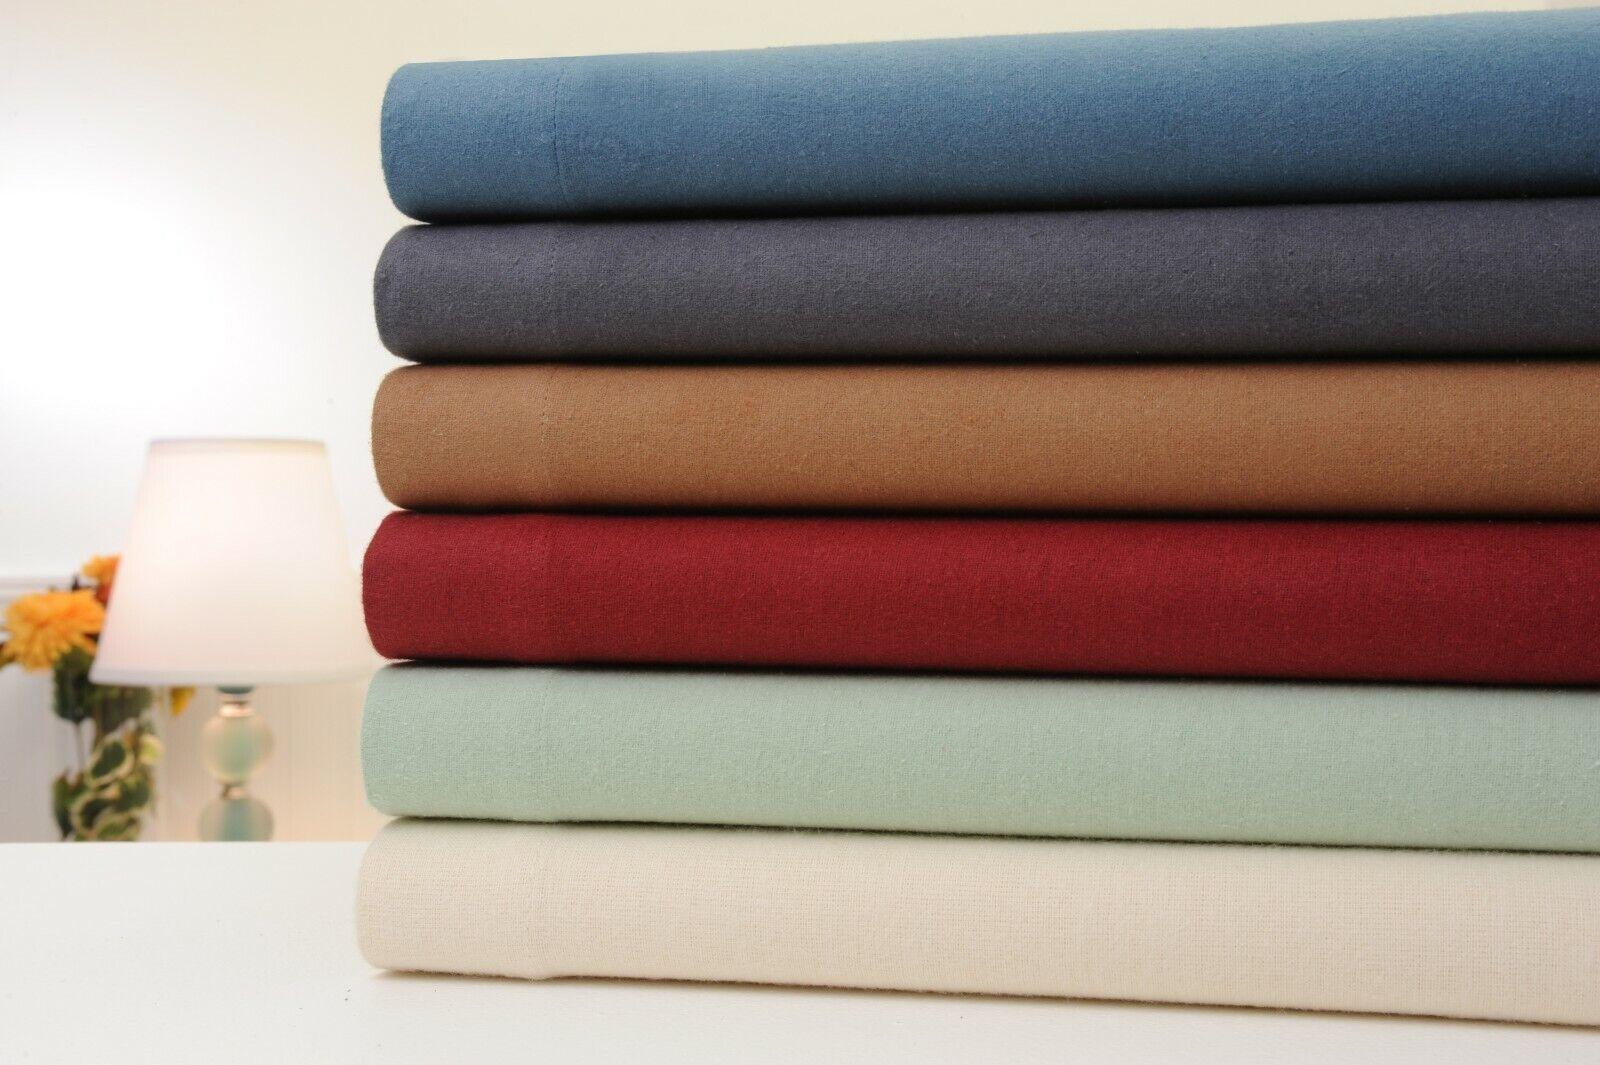 Bibb Home 100% Cotton Solid Flannel Sheet Set - Cozy, Soft,